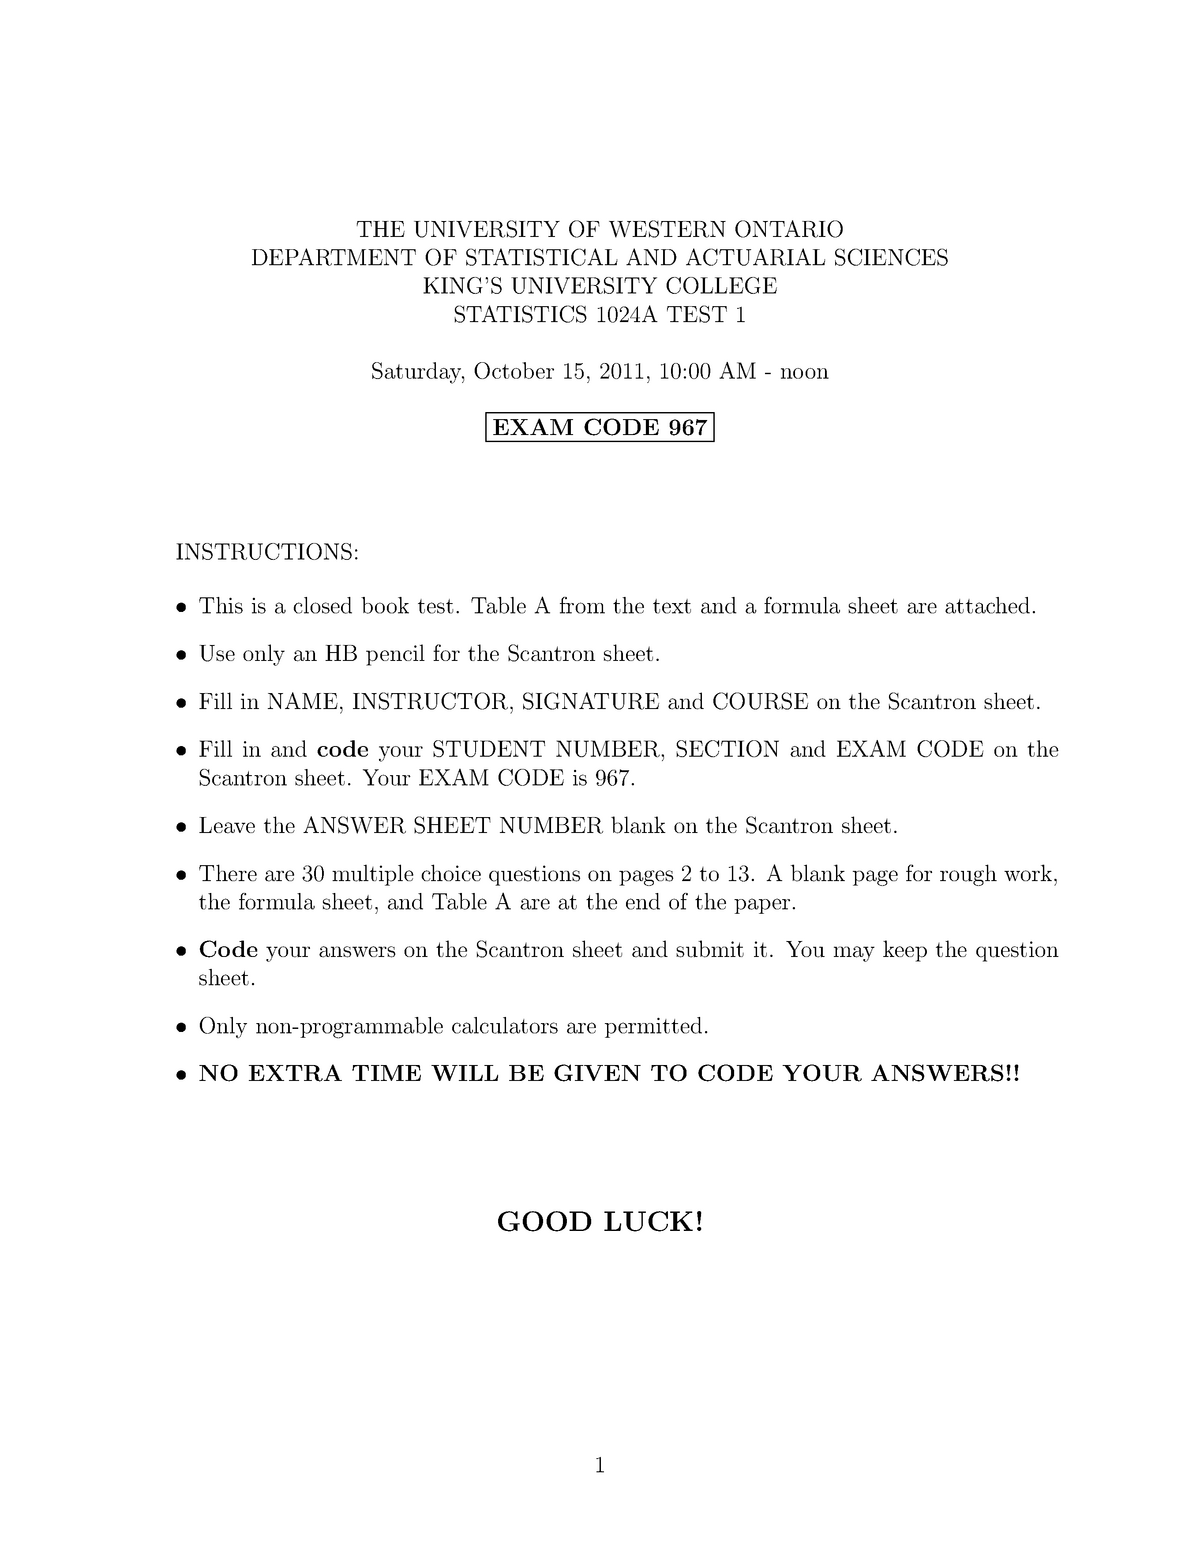 Exam 2011 - 1024 A/B: Introduction to Statistics - StuDocu